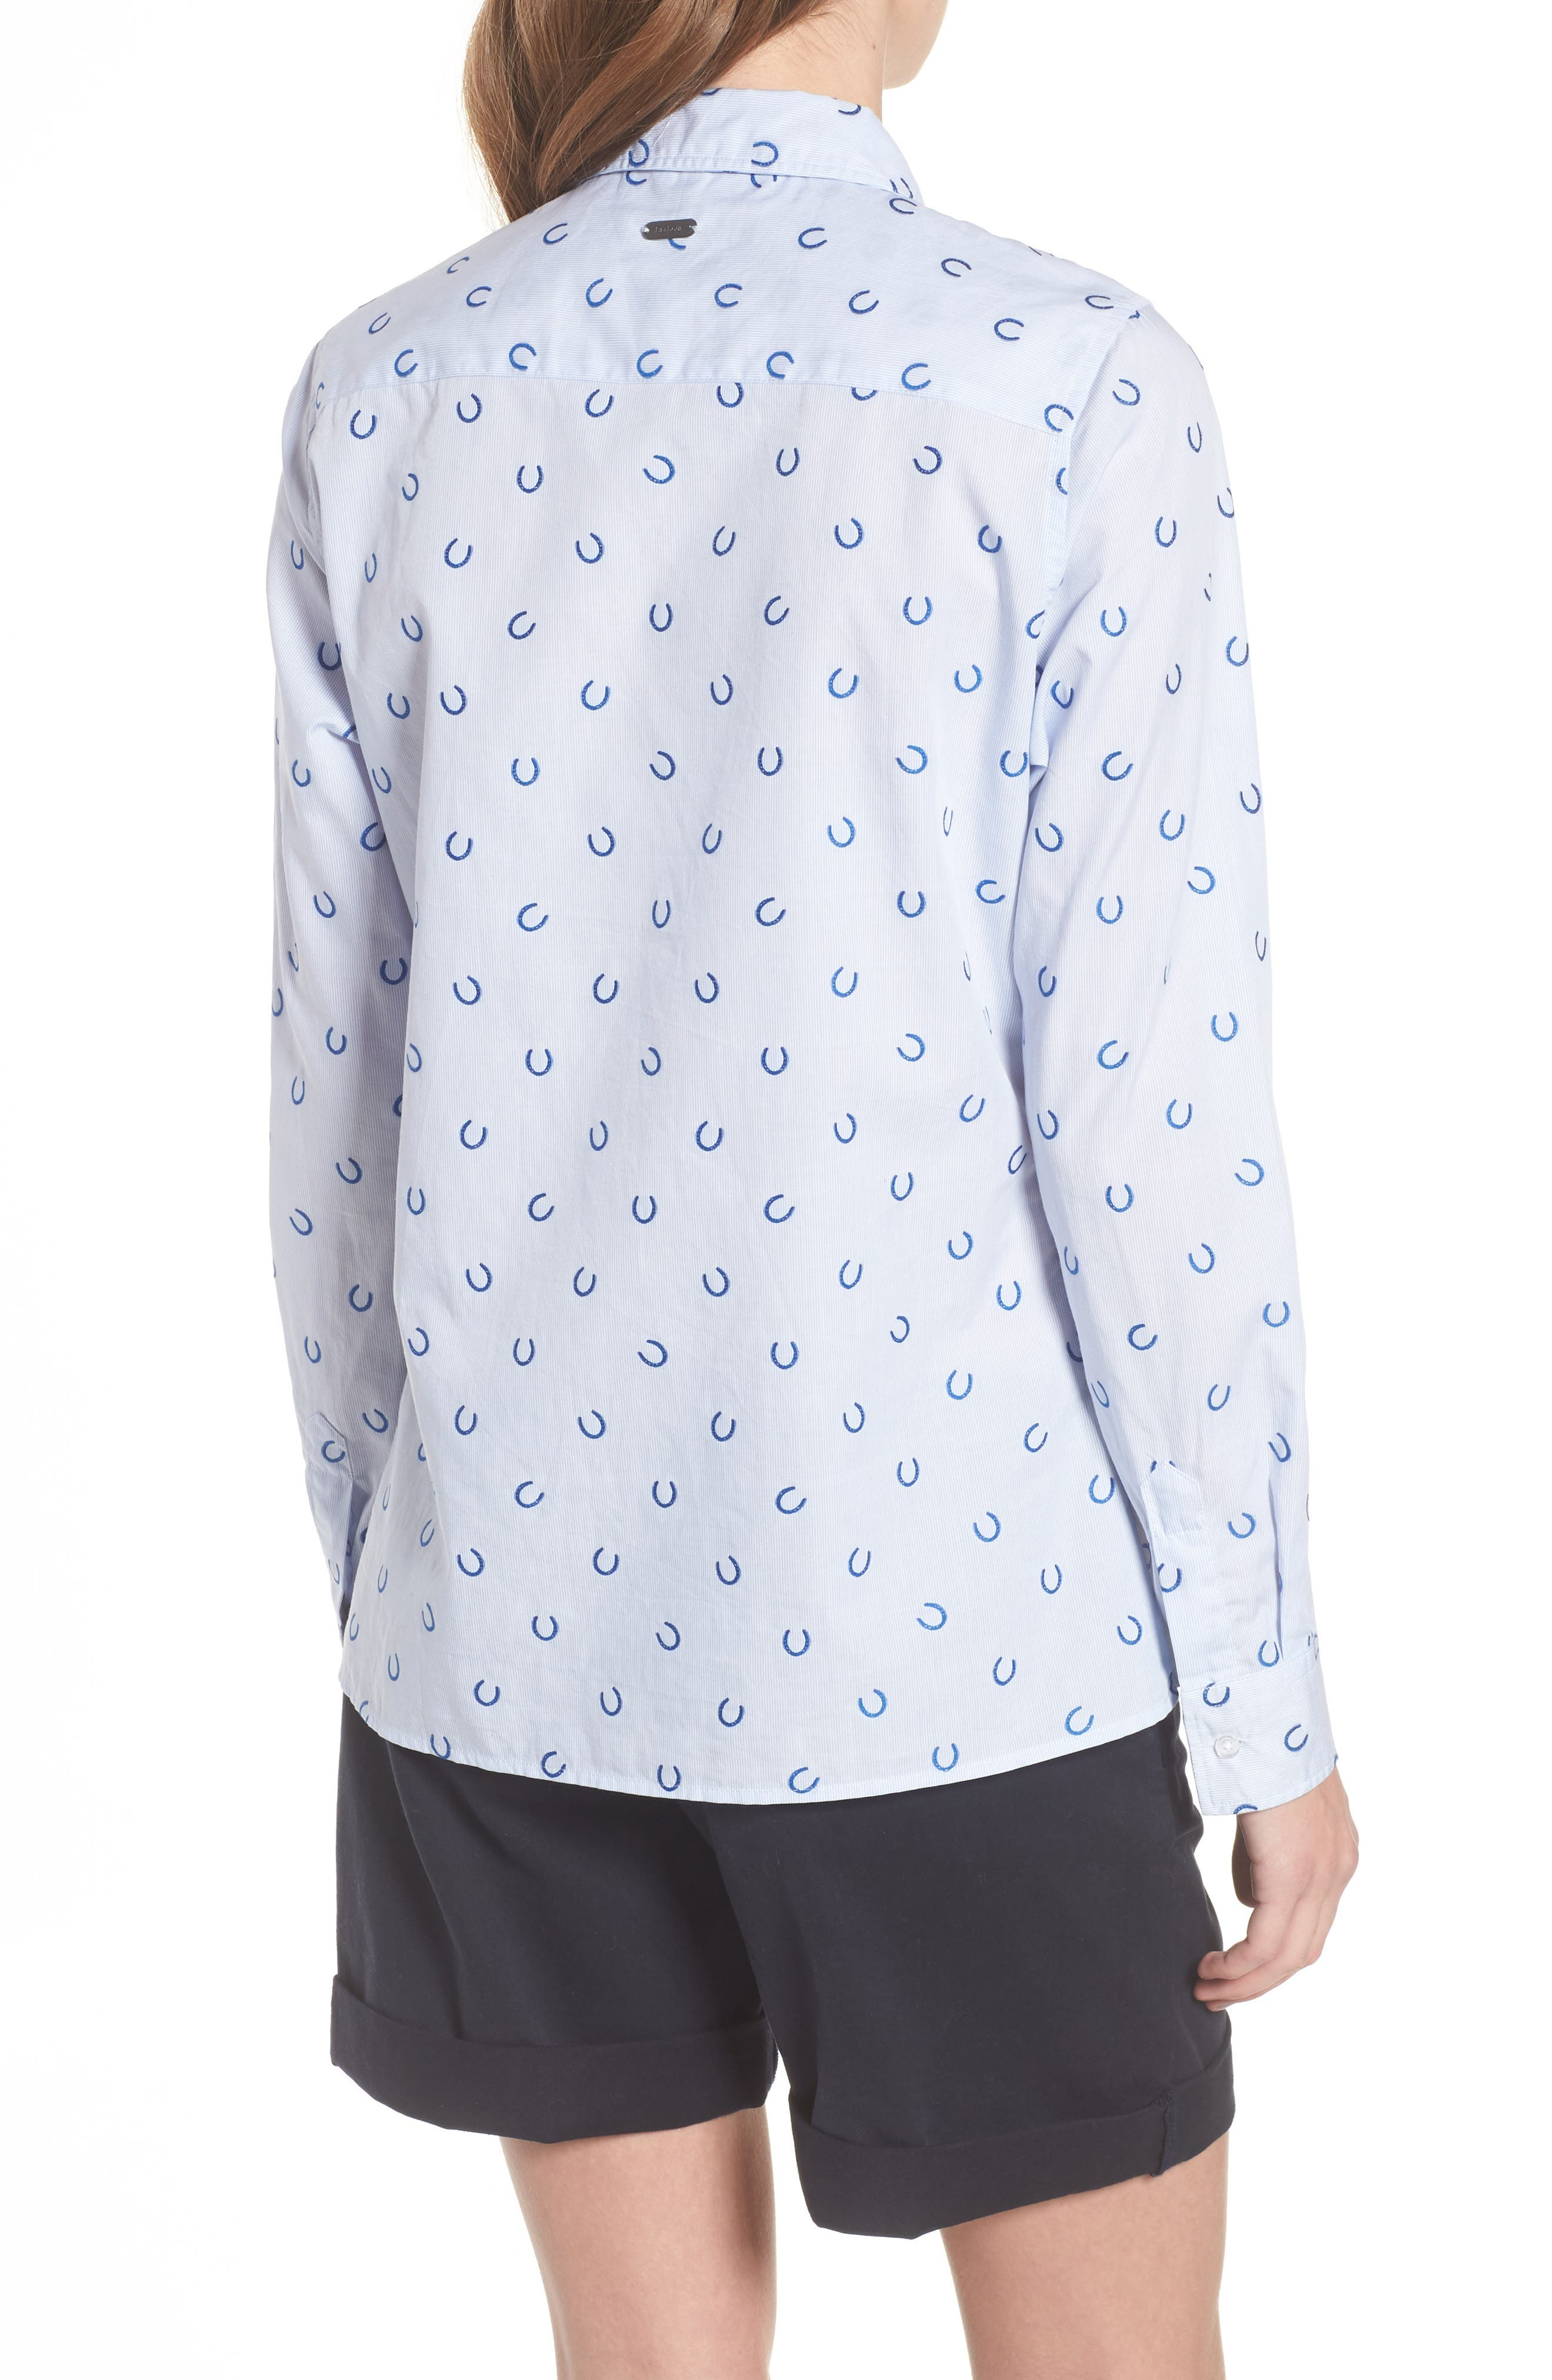 Daisyhill Regular Fit Shirt,                             Alternate thumbnail 2, color,                             Pale Blue